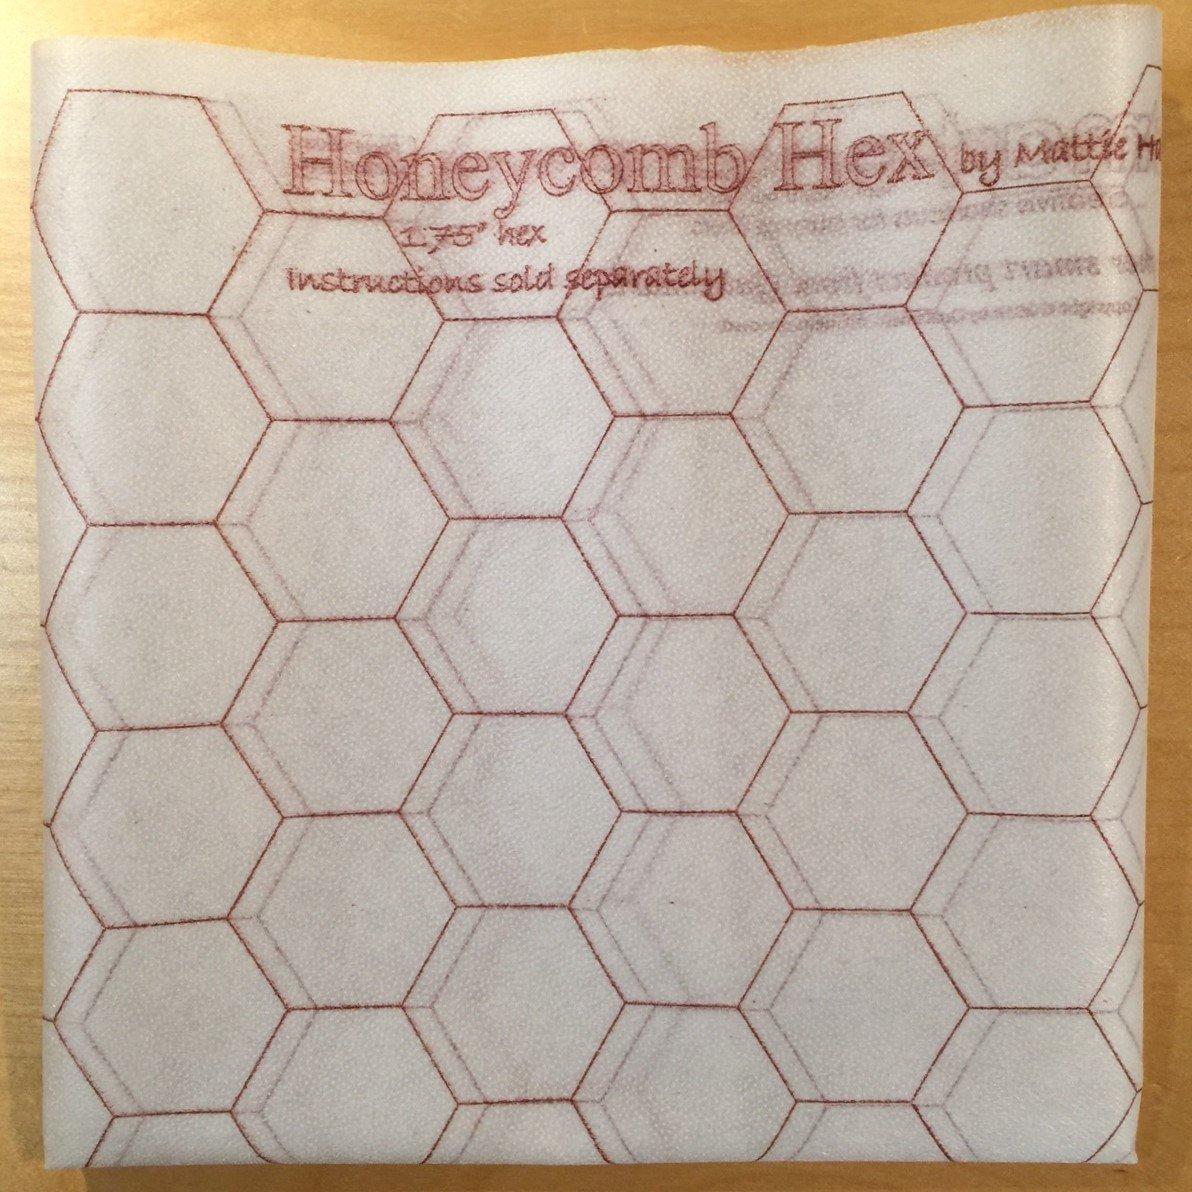 Honeycomb Hex Interfacing panel